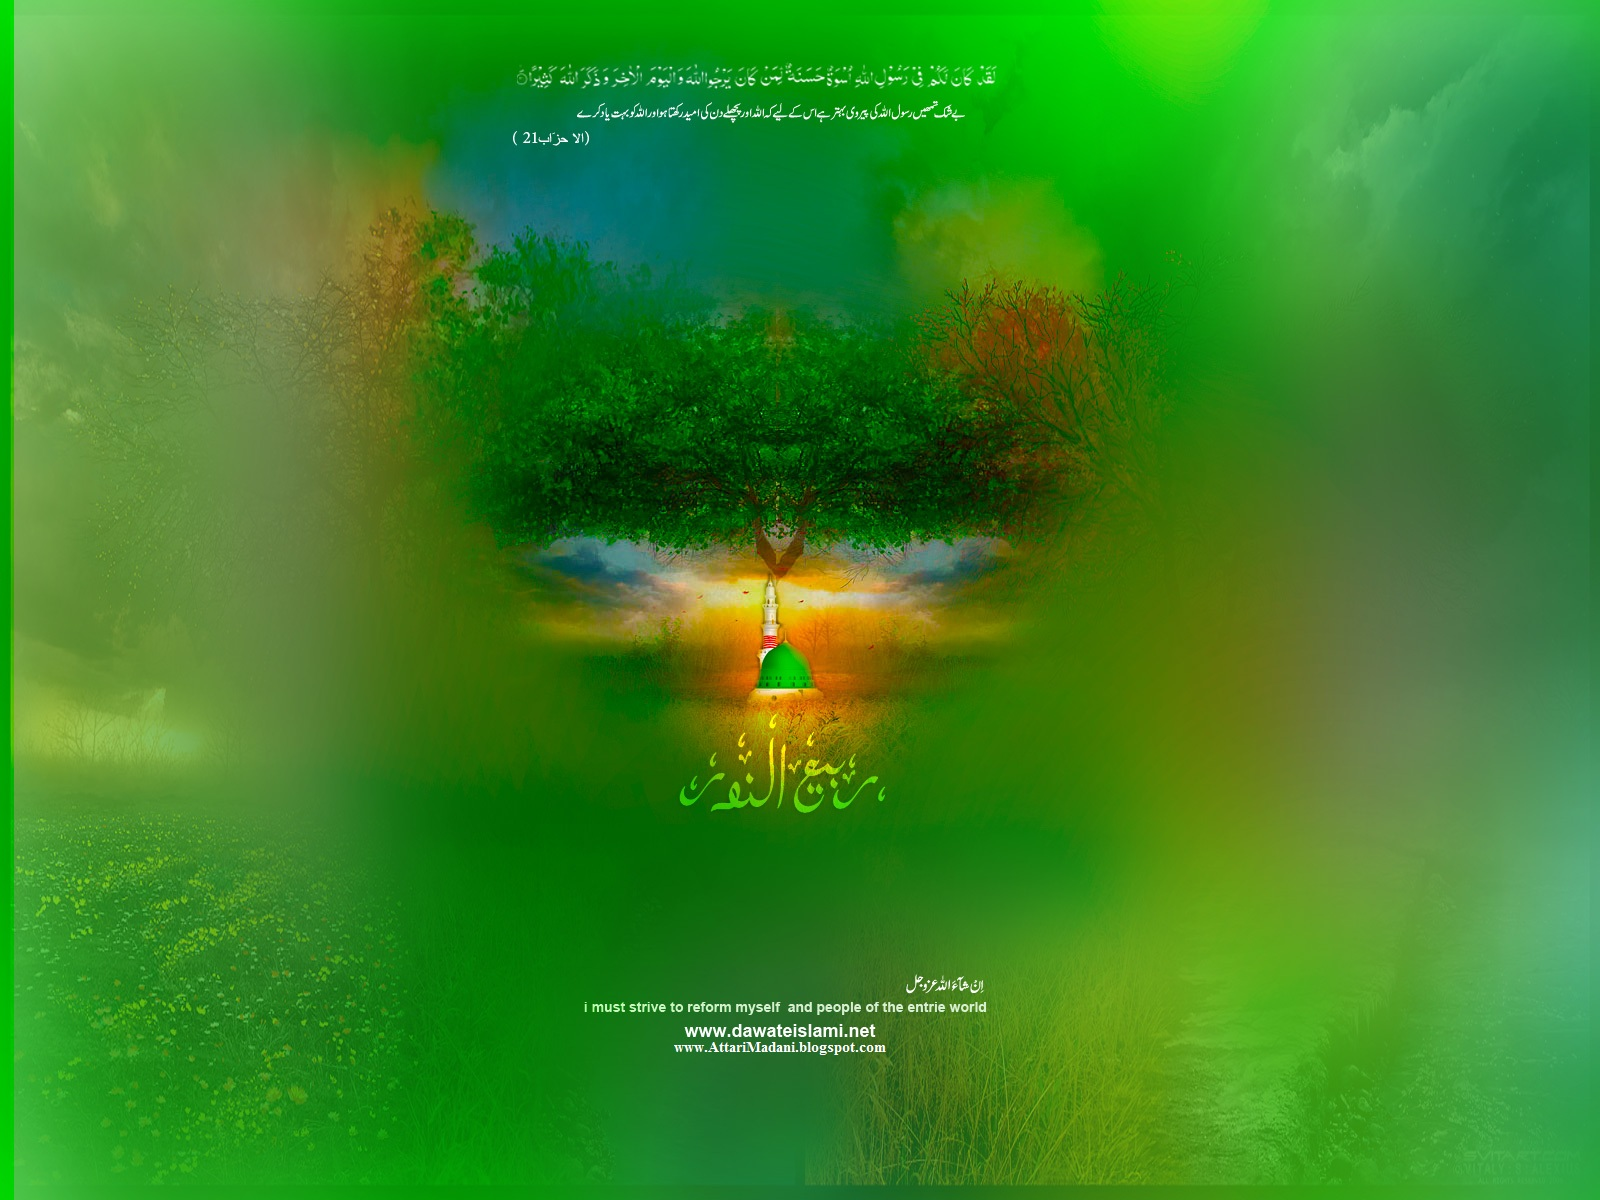 http://3.bp.blogspot.com/-1UAc6Y-by68/Tx7z0gHjU9I/AAAAAAAAA8I/18HbvxCawDE/s1600/jashn_e_eid_milad_un_nabi_wallpaper_by_dawat_e_islami-13.jpg